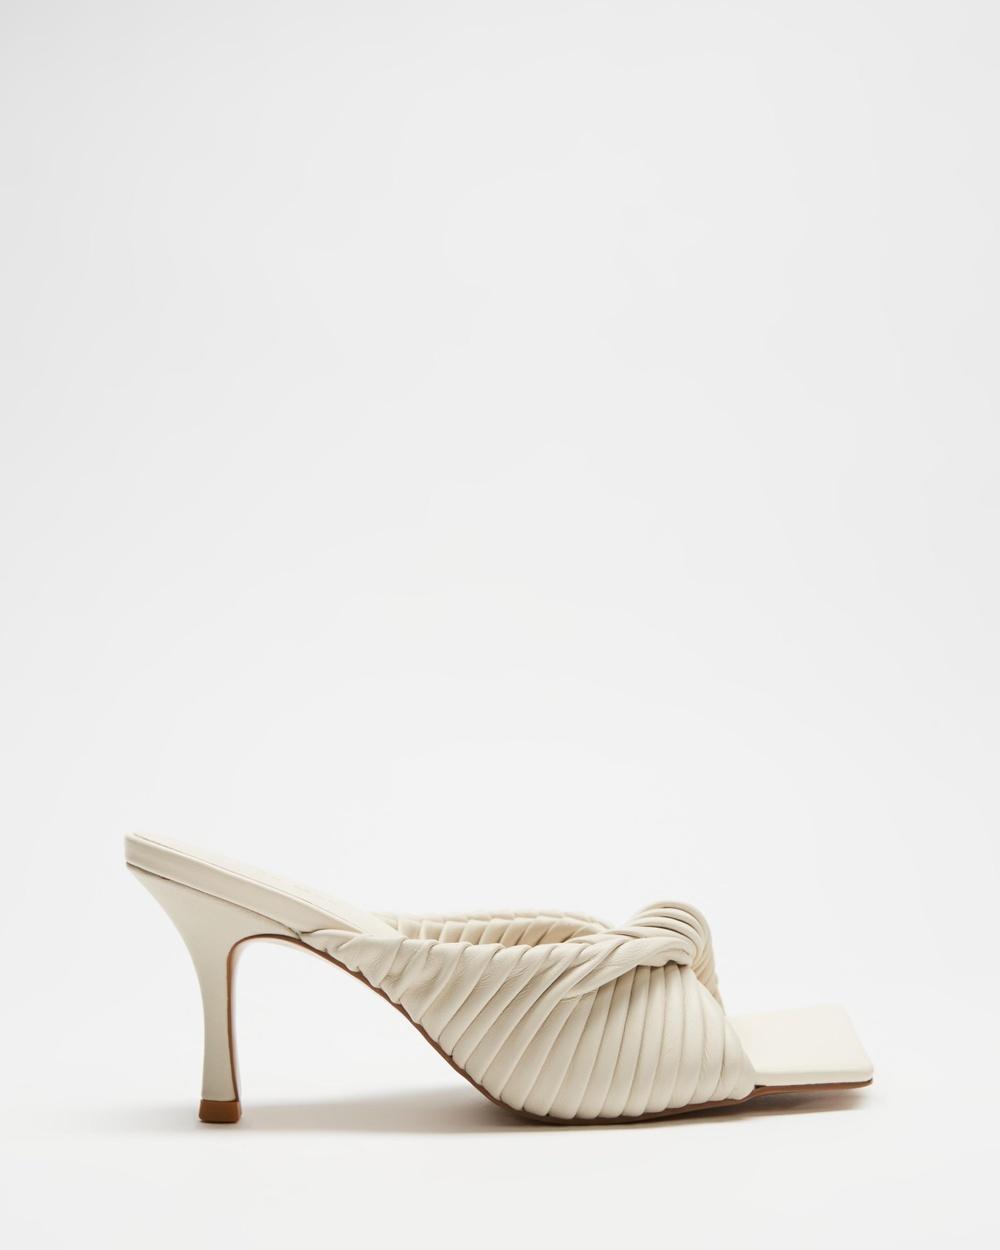 Alias Mae Flora Heels Bone Leather